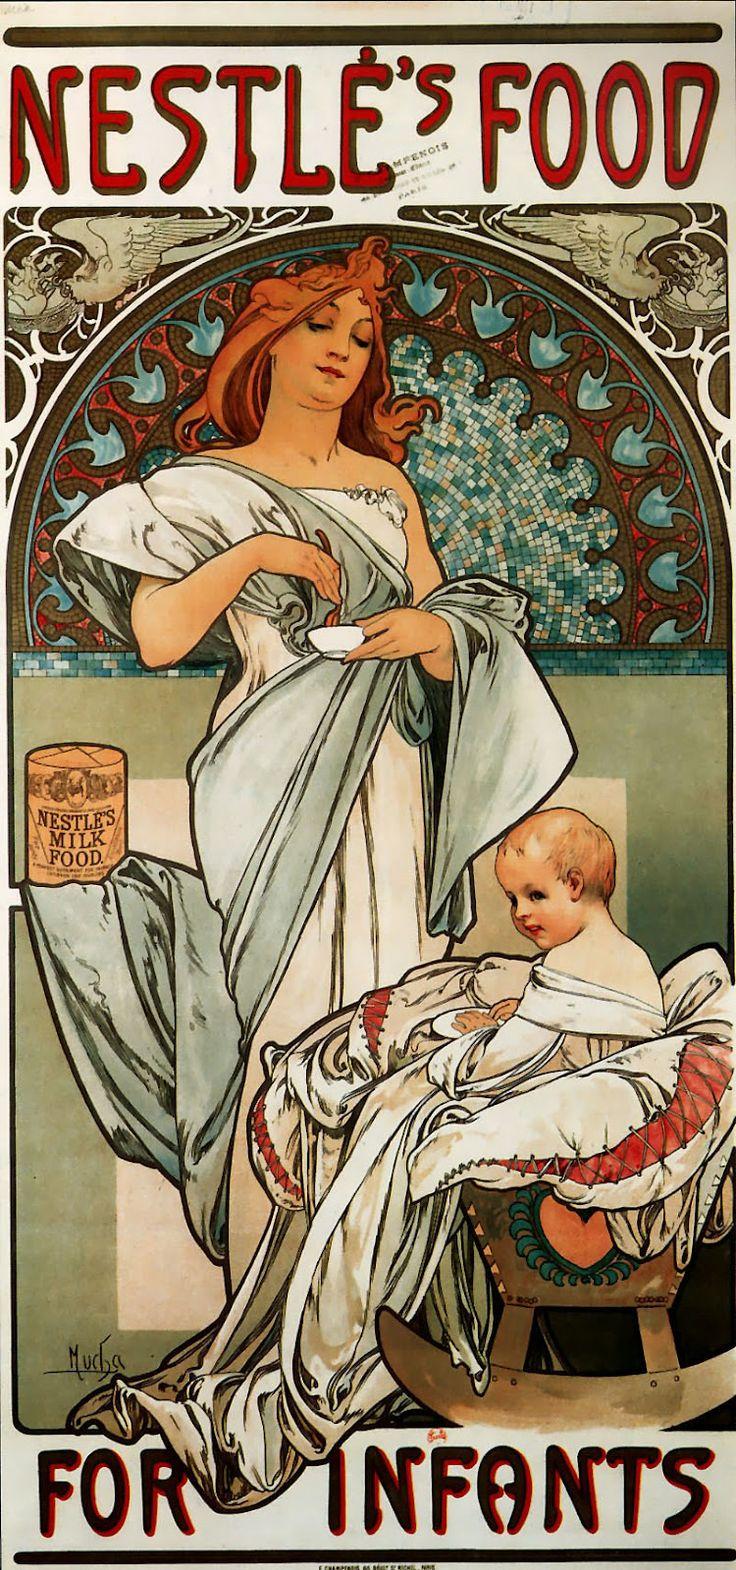 Breastfeeding is better than nestle formula. checkn da facts. be informed.